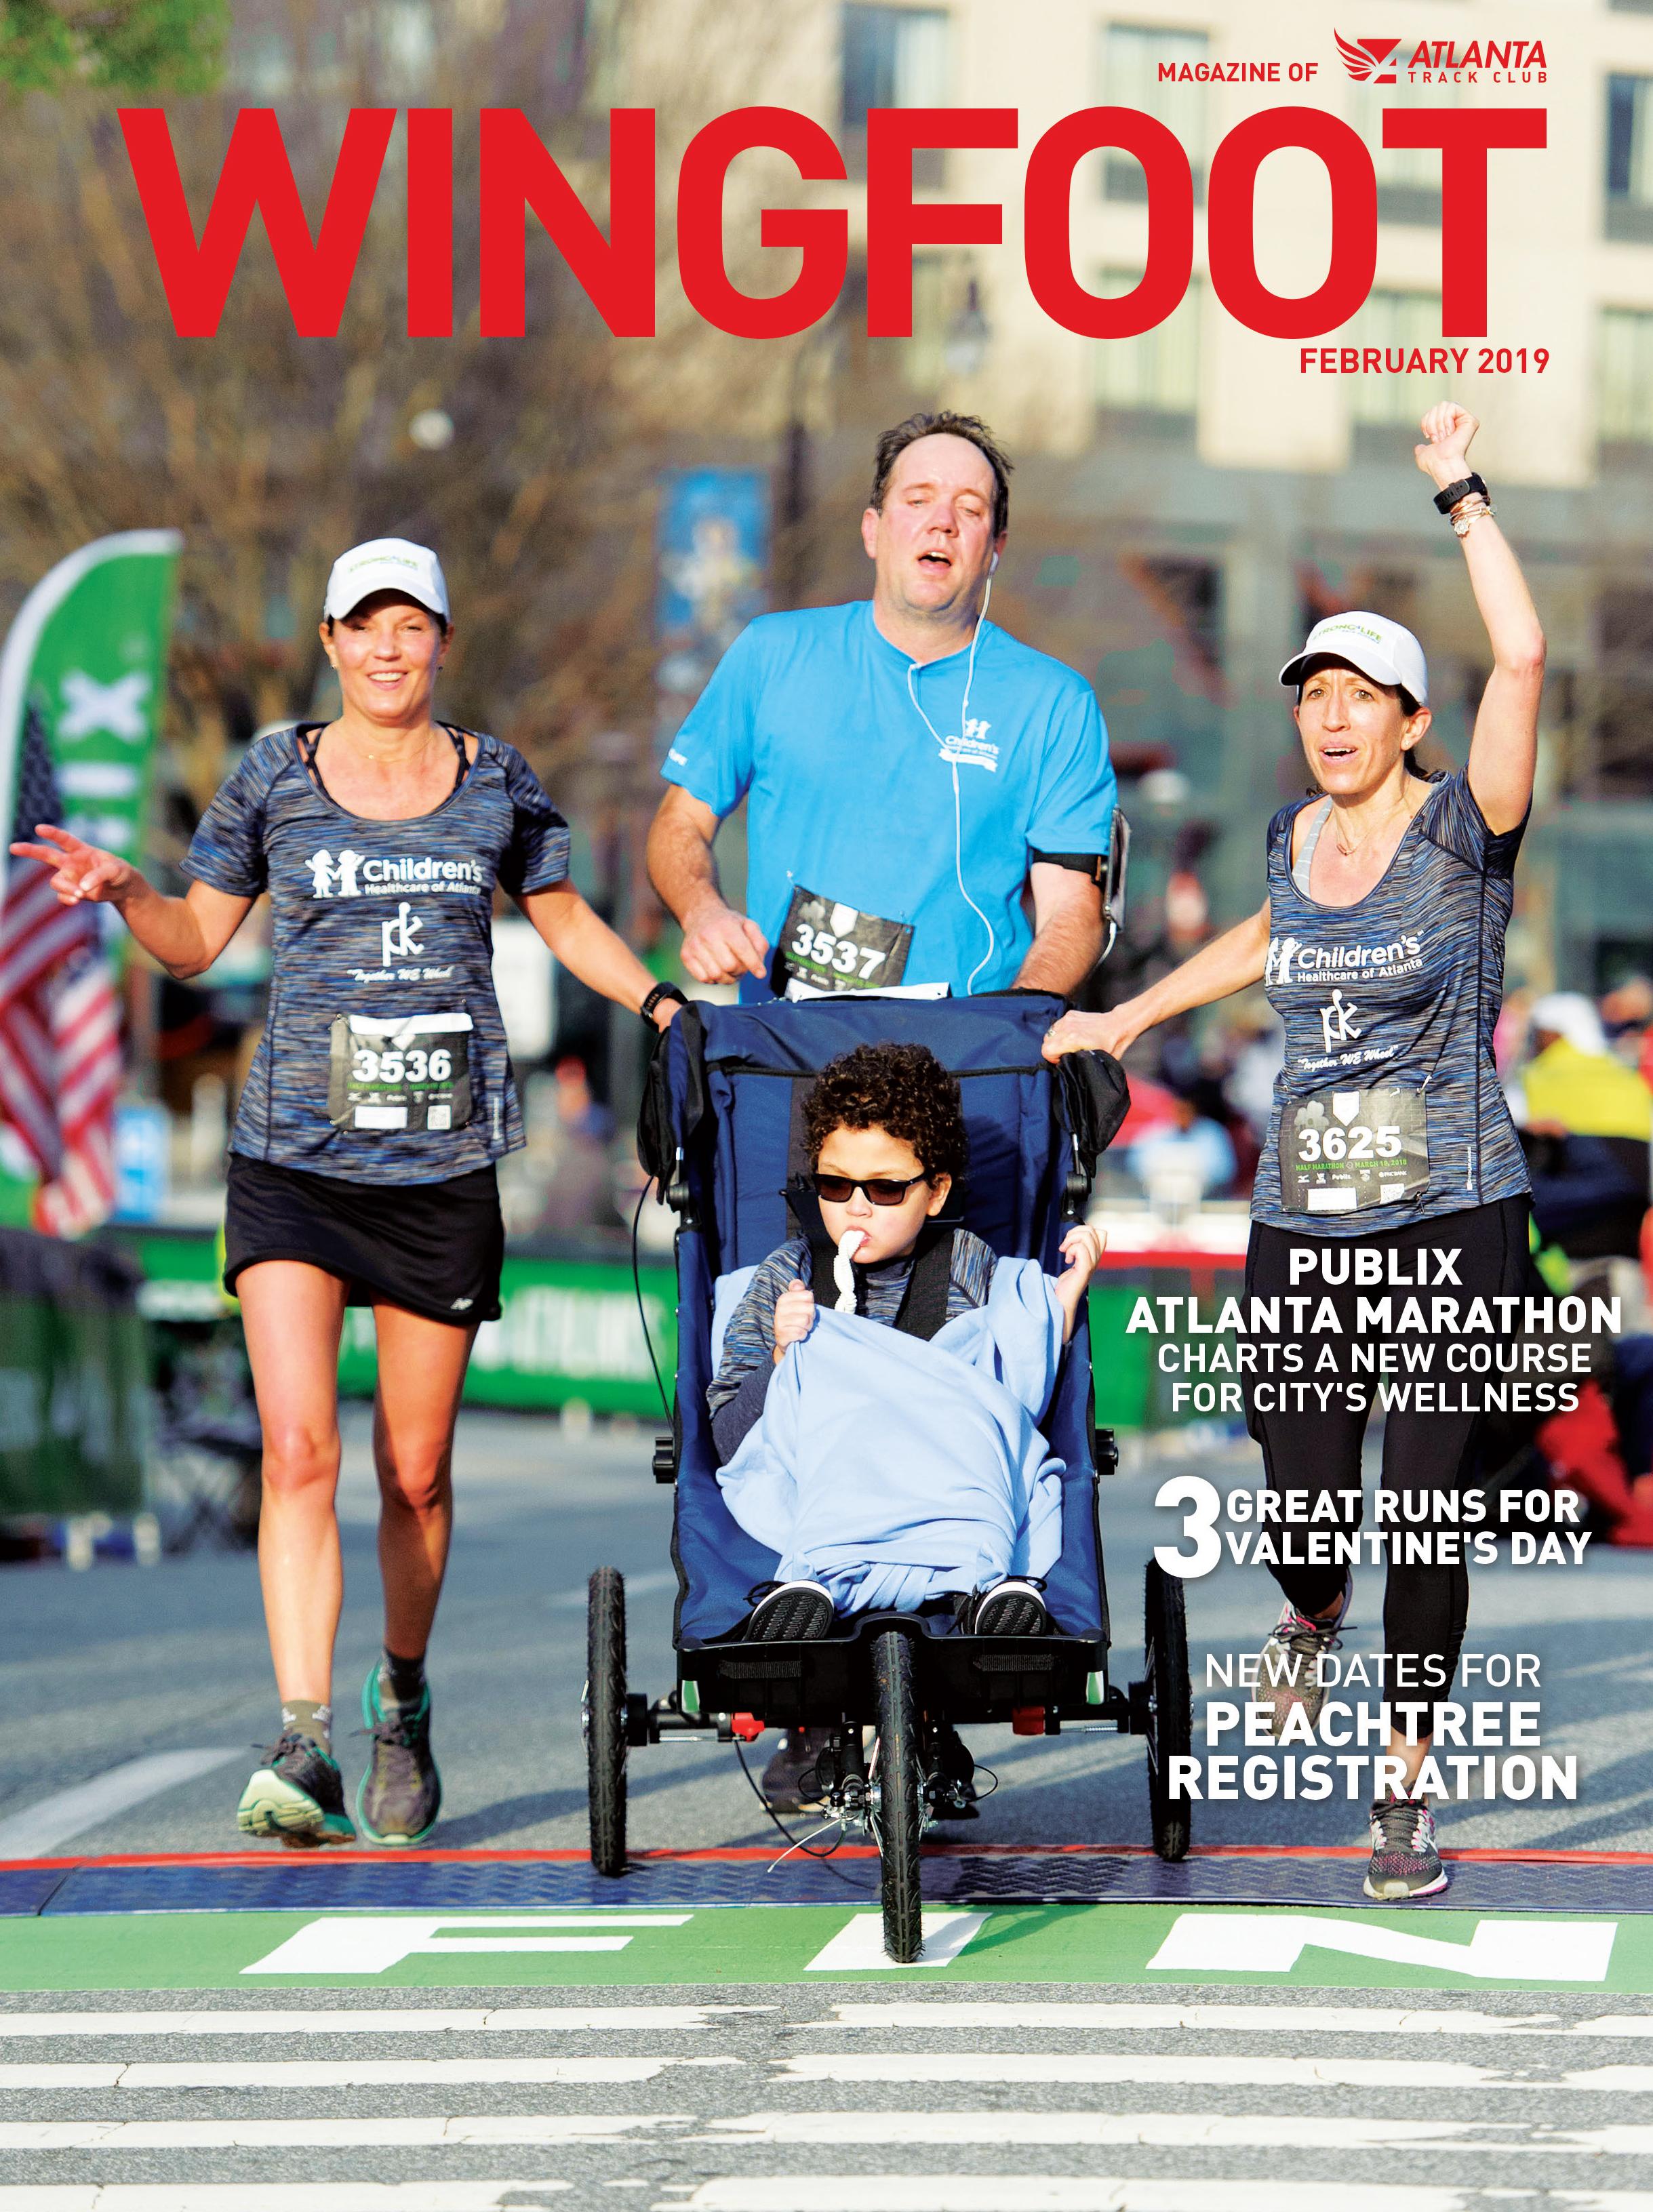 Wingfoot Magazine